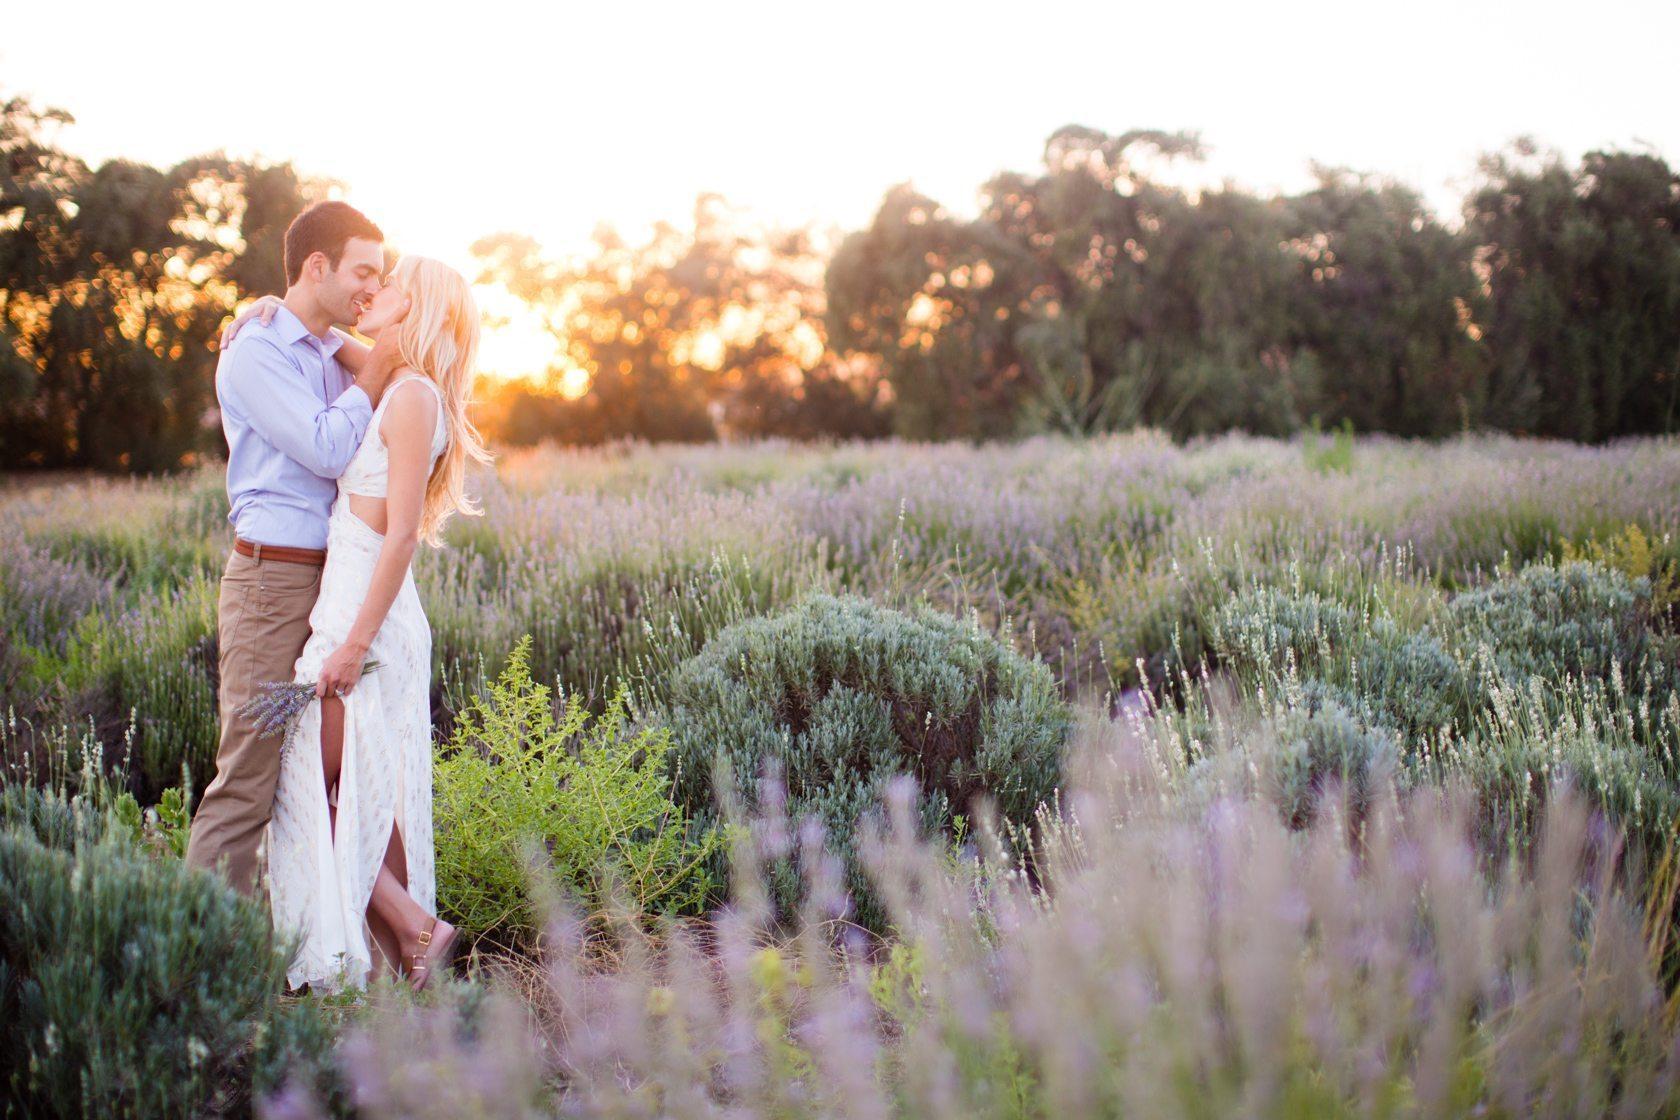 Highland_Springs_Lavender_Field_Engagement_42.jpg